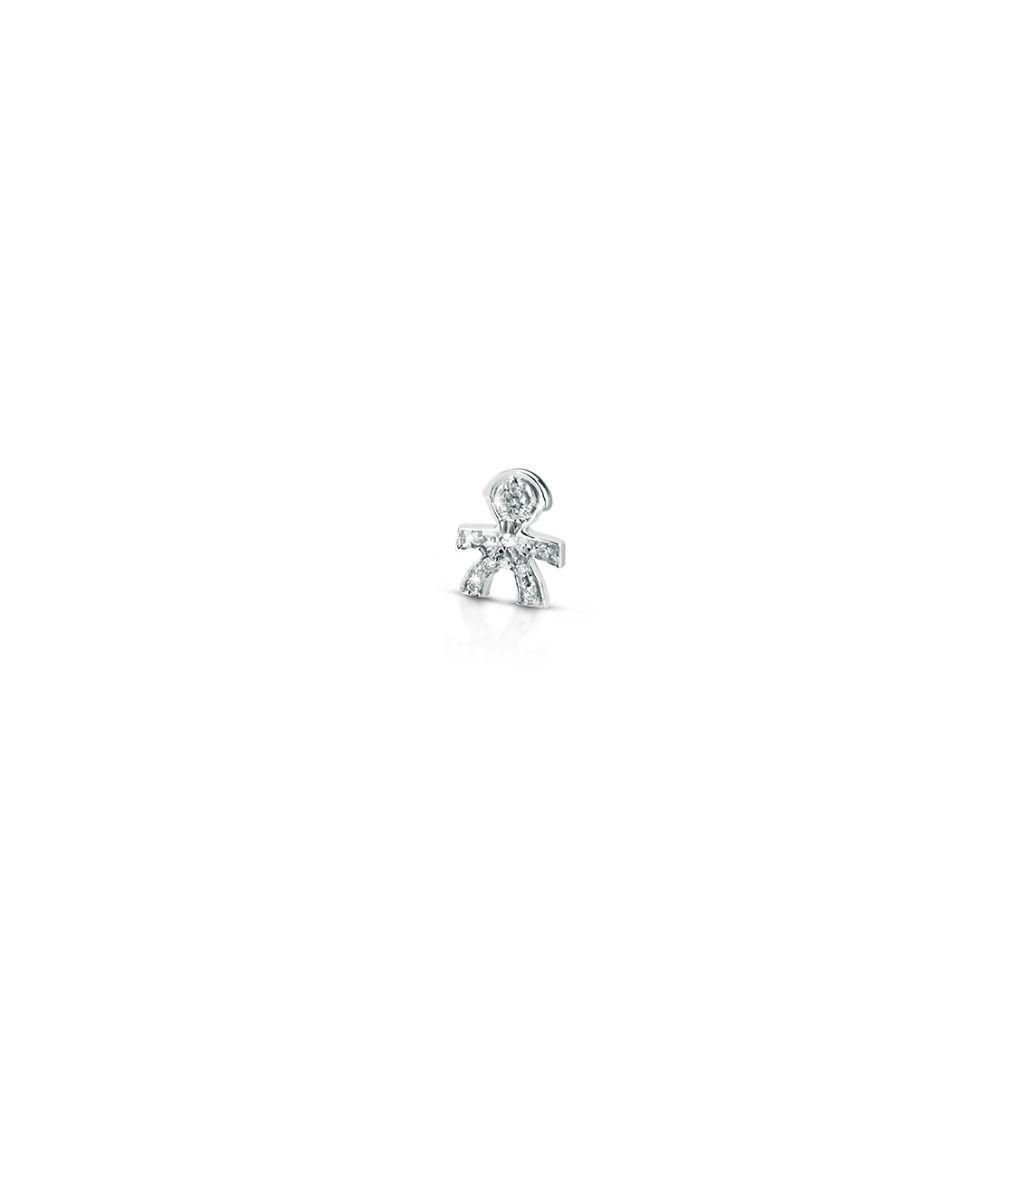 Orecchino  (singolo) Le Bebè Bimbo                                LBB015